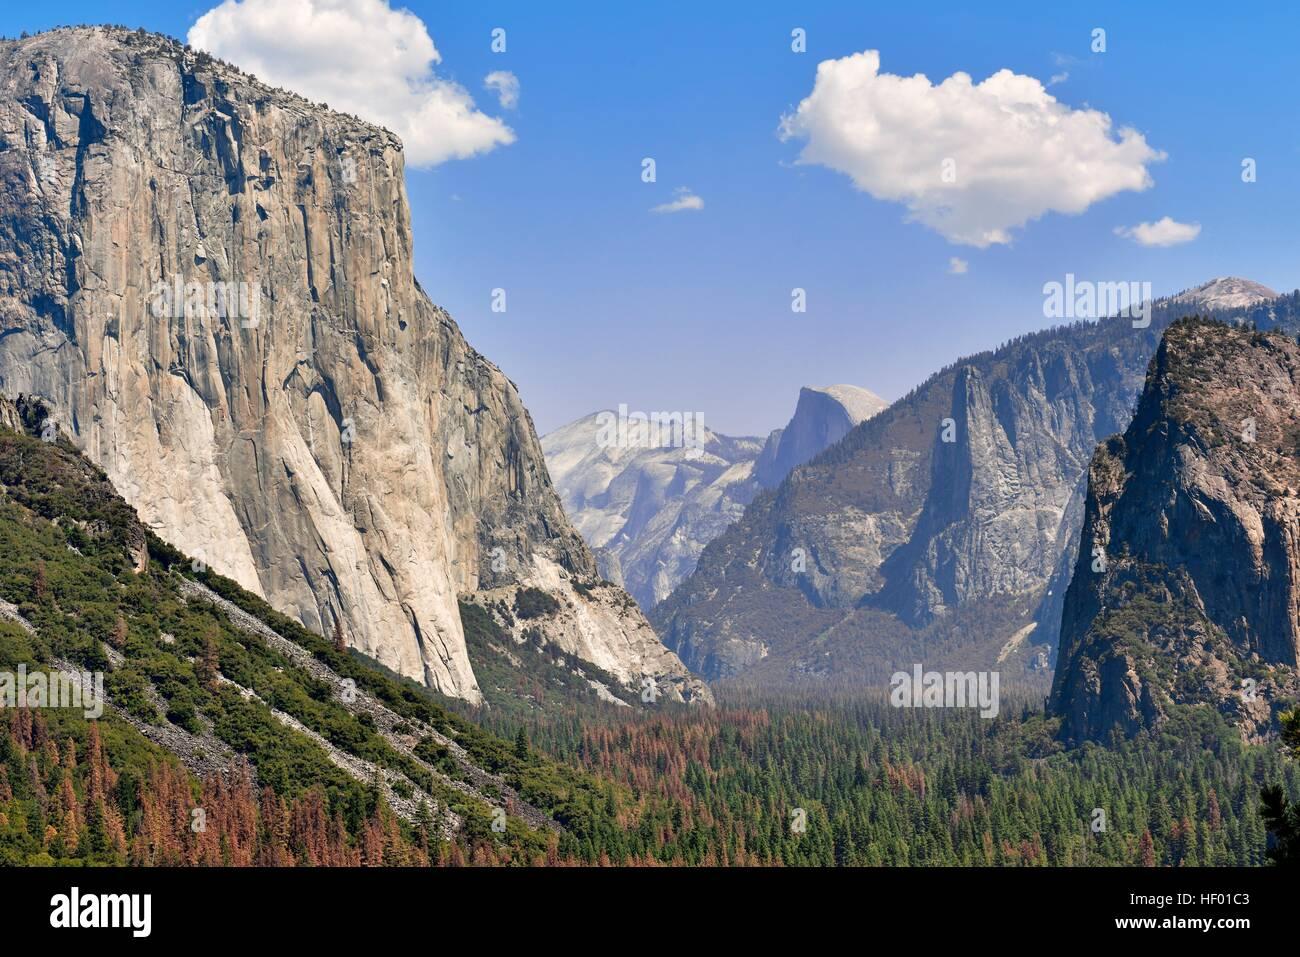 View of the Yosemite Valley, granite cliffs, El Capitan, Half Dome,  mountains, Yosemite National Park, California, USA